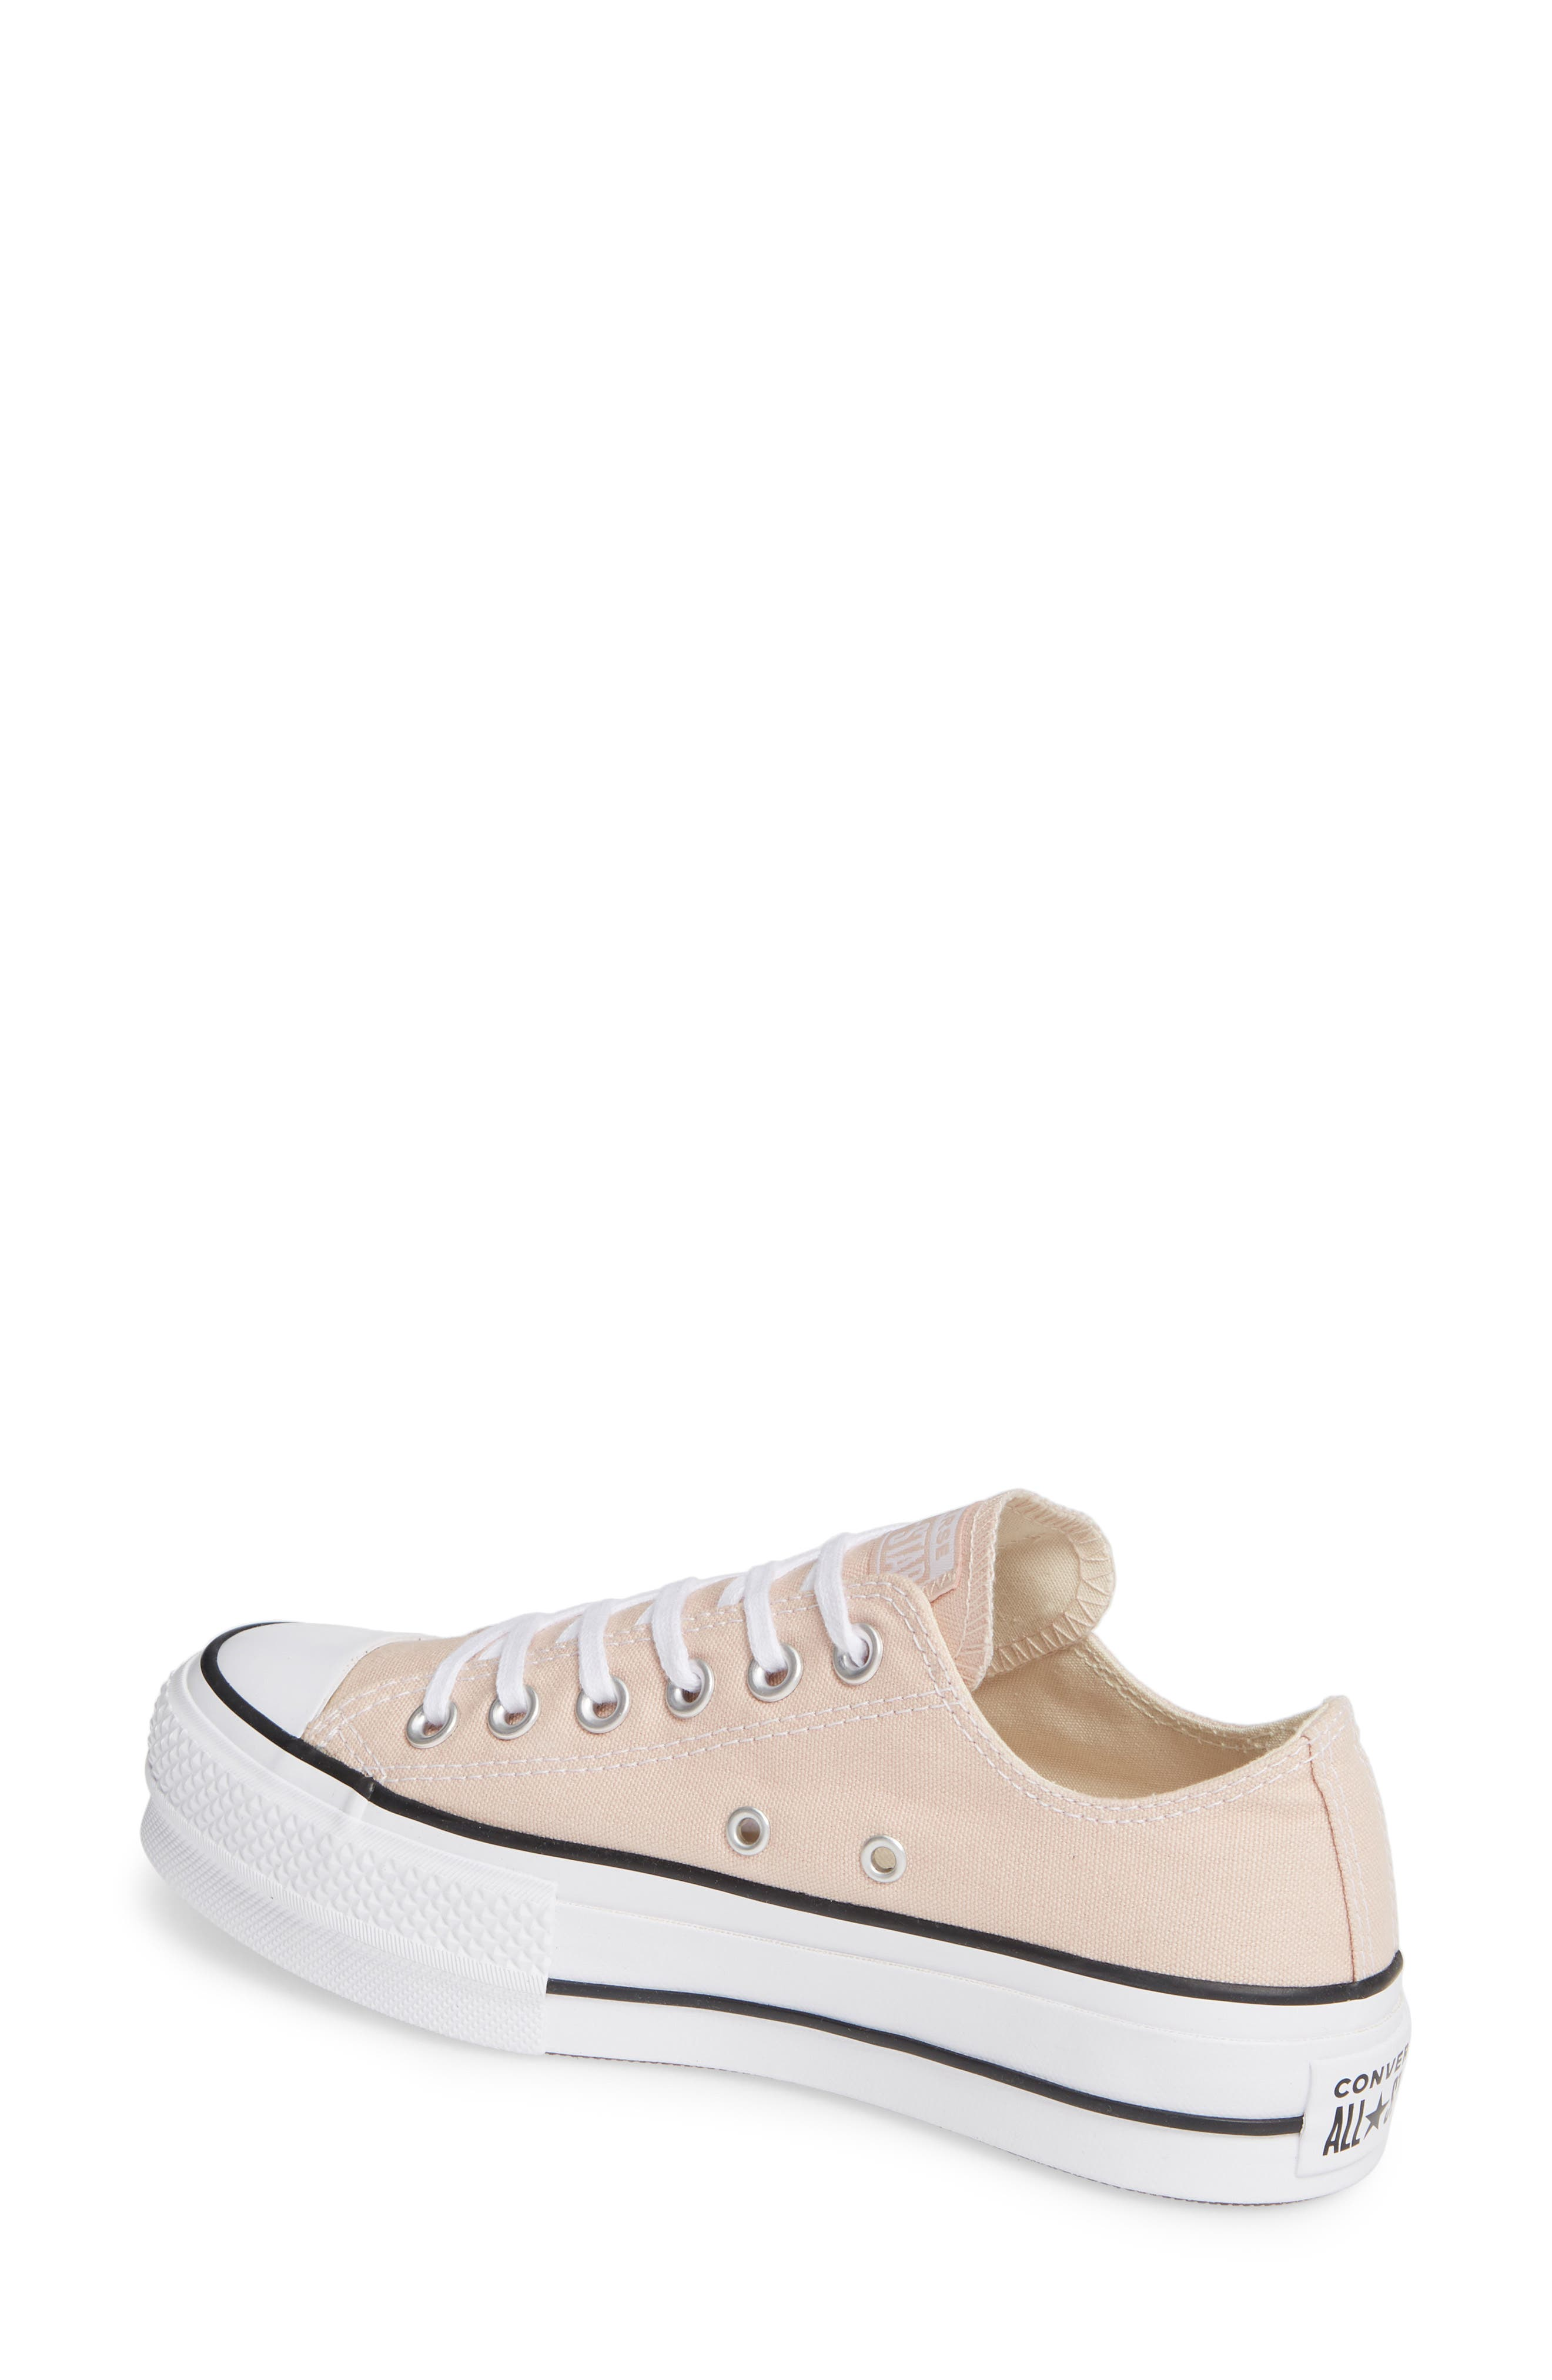 CONVERSE,                             Chuck Taylor<sup>®</sup> All Star<sup>®</sup> Platform Sneaker,                             Alternate thumbnail 2, color,                             650